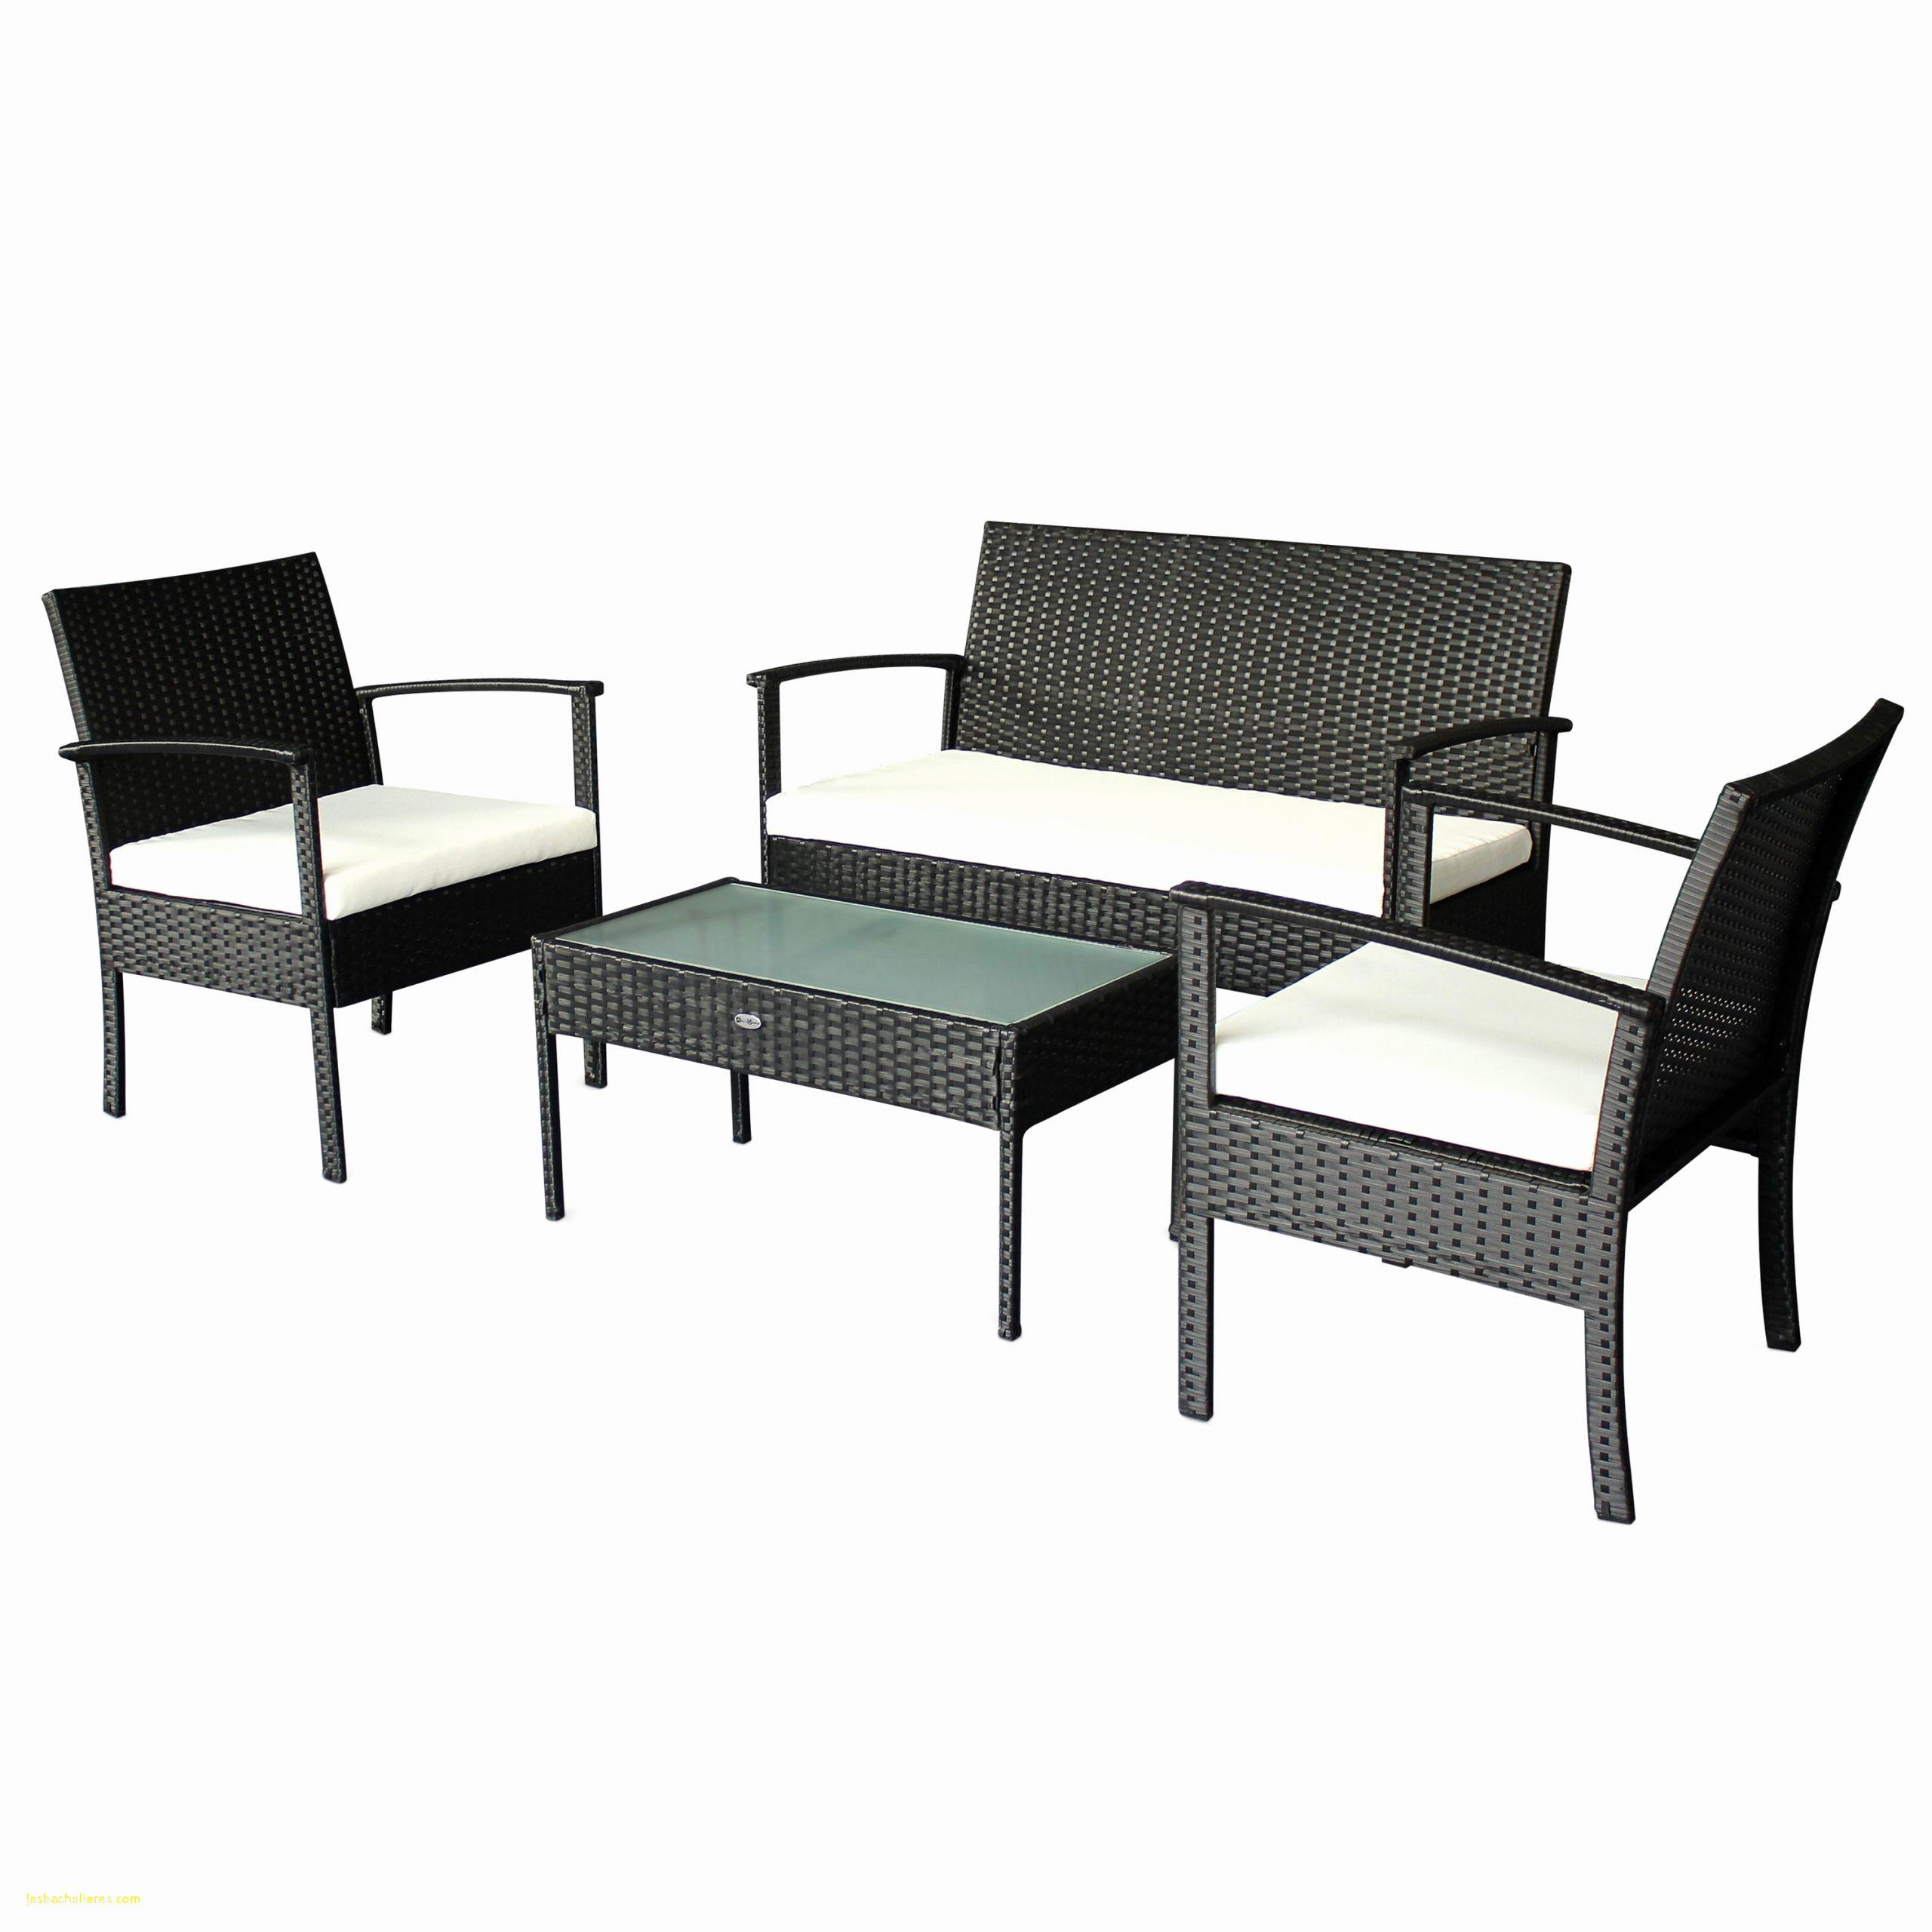 Source D'inspiration Table Bistro Haute - Luckytroll serapportantà Table Basse De Jardin Ikea